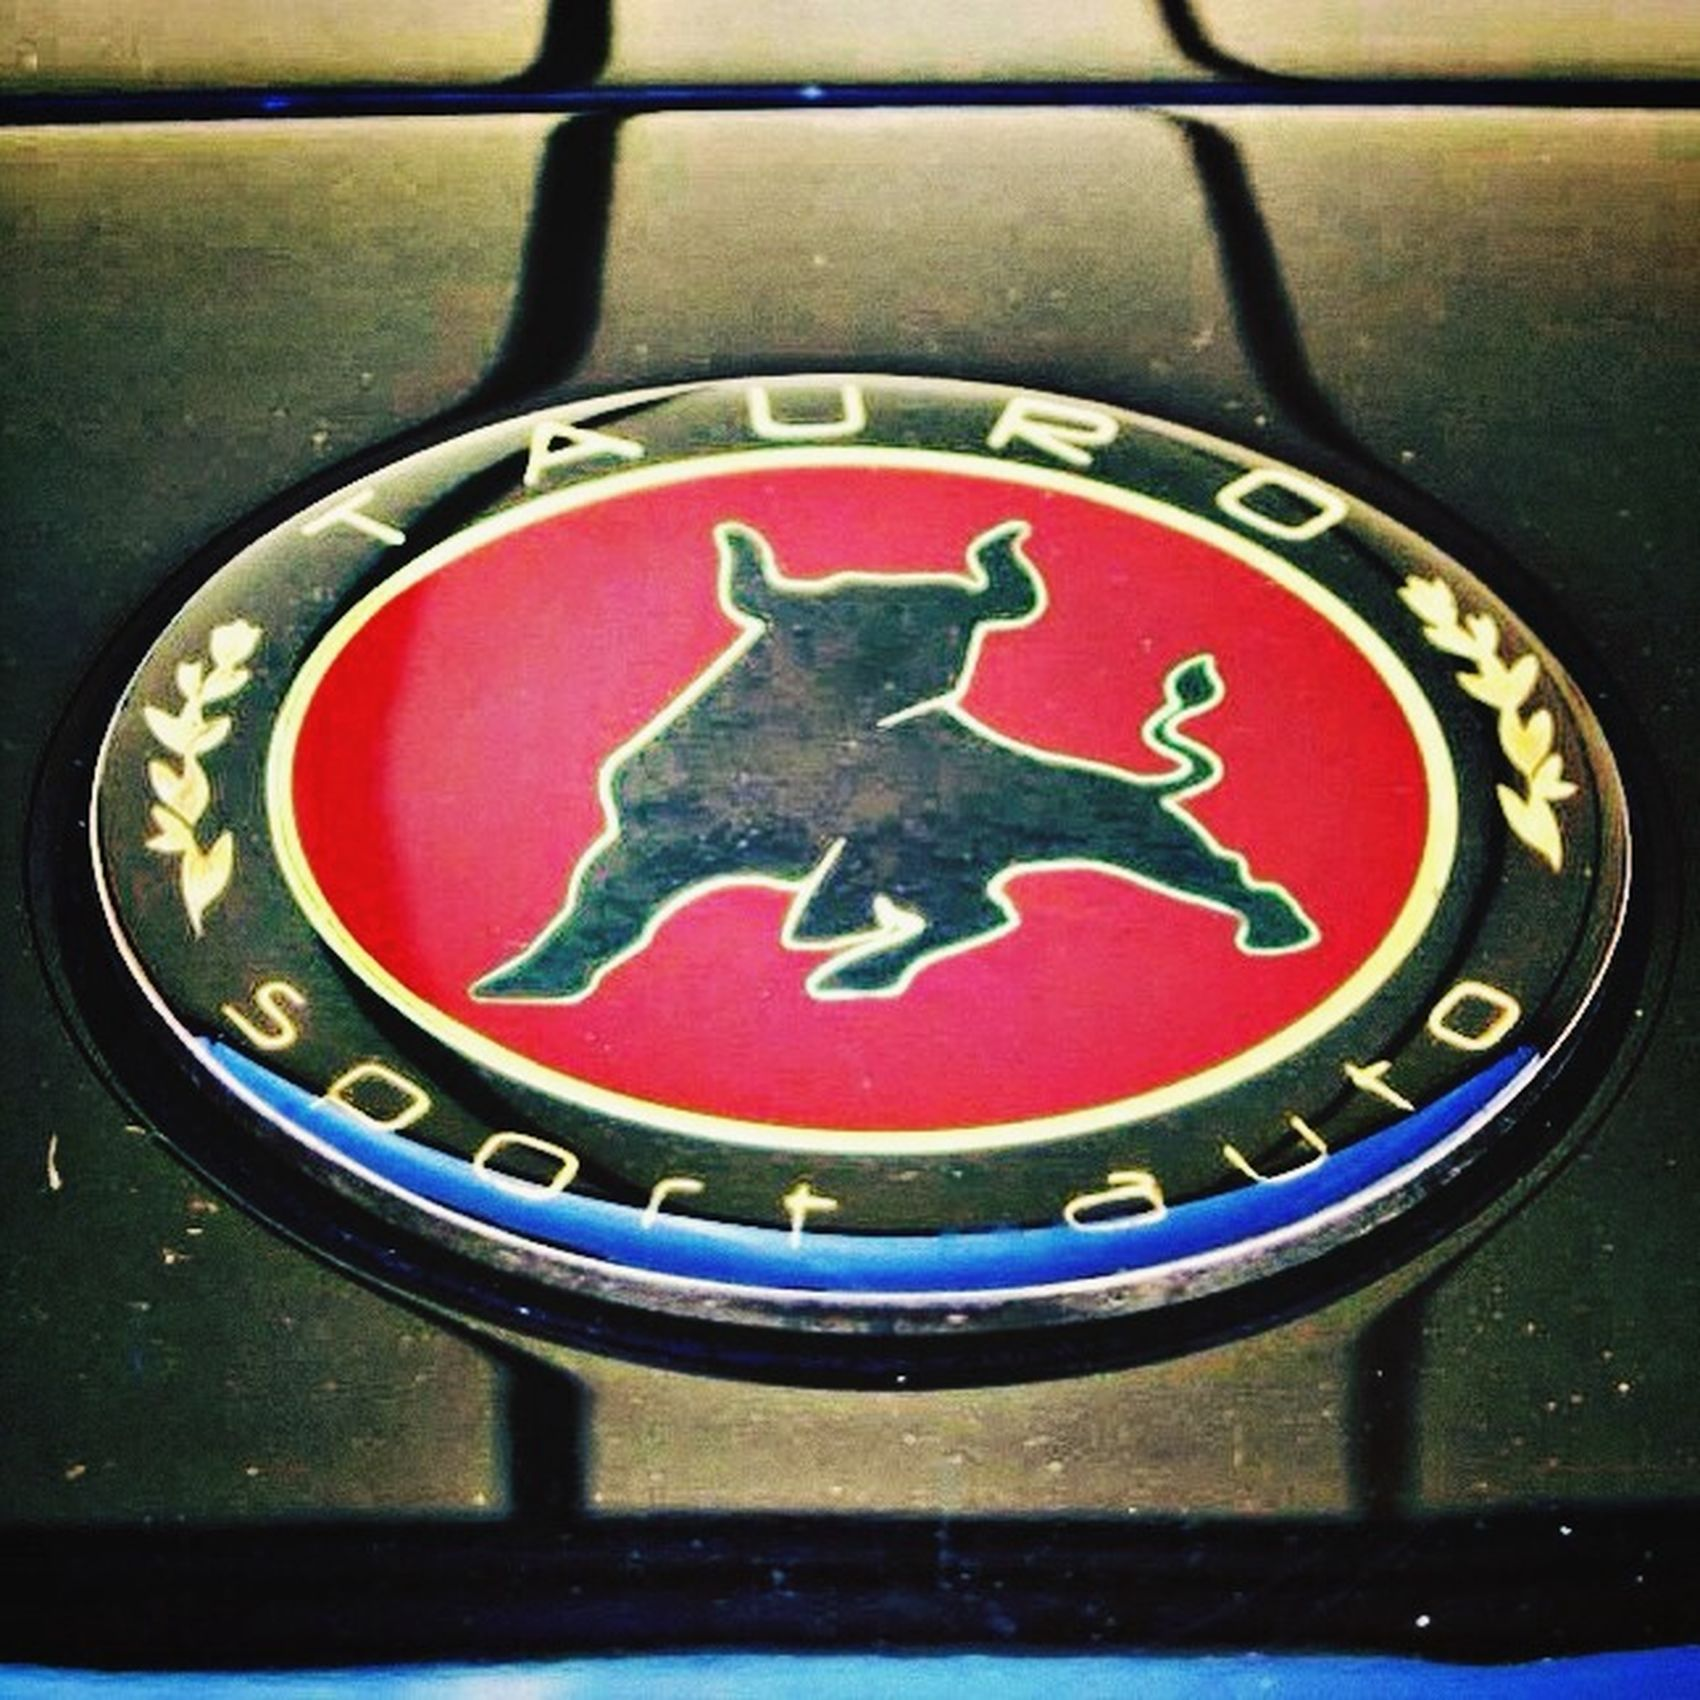 Tauro Auto Spot Goodwood Festival Of Speed 2013 Car Badge